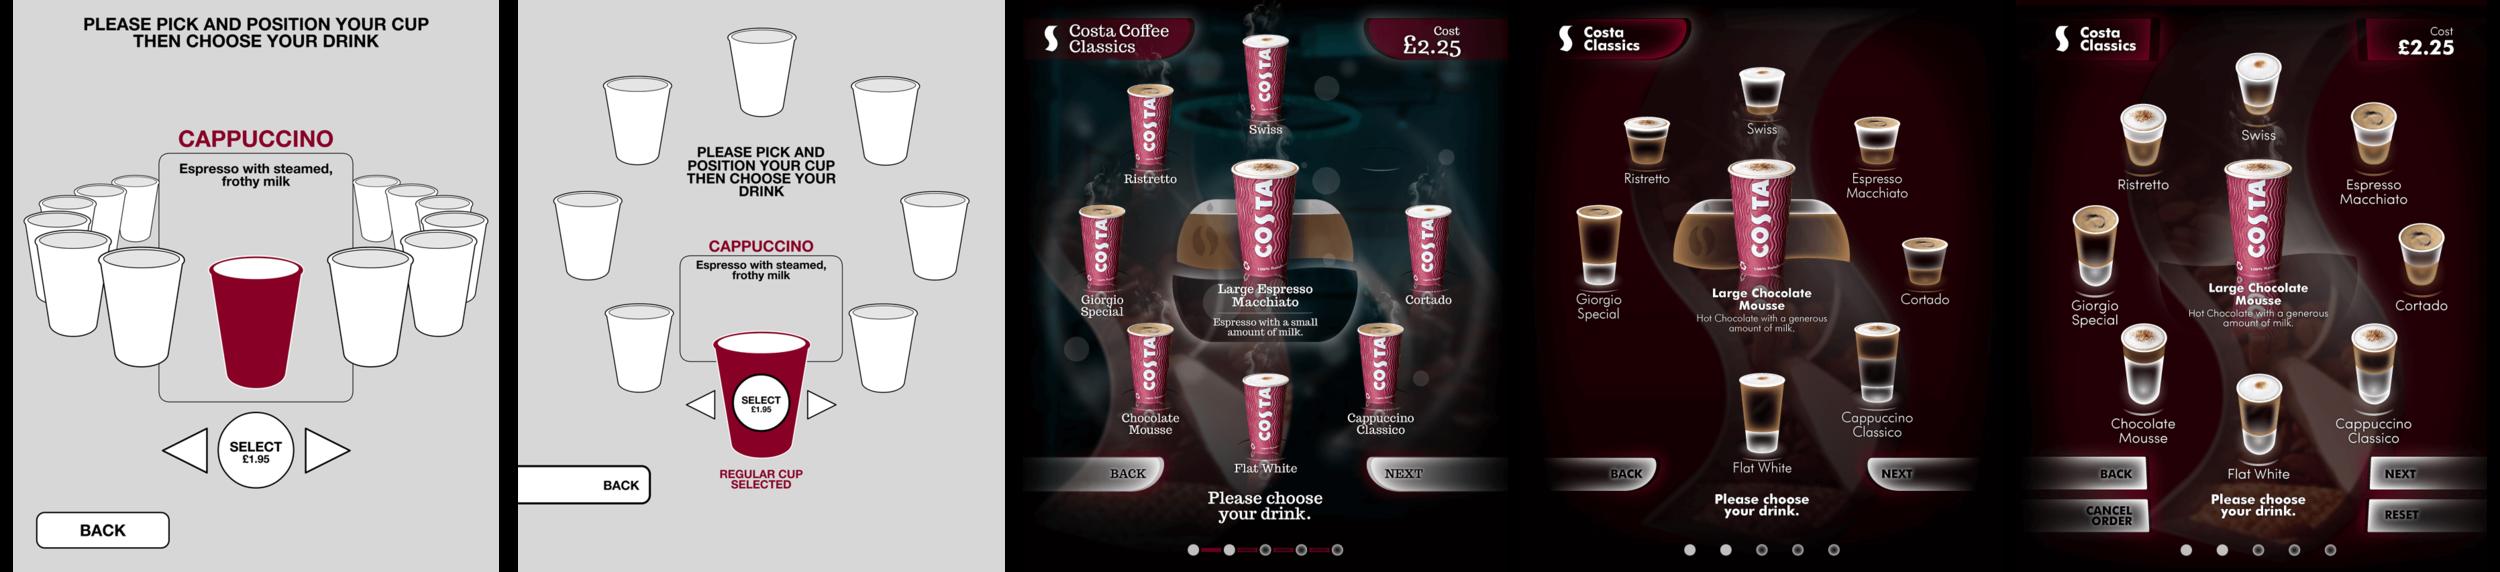 Atomhawk_Costa-Coffee_CEM200-Vending-Machine_UI-UX-Design_Visual-MockUp_Screen-MockUps.png